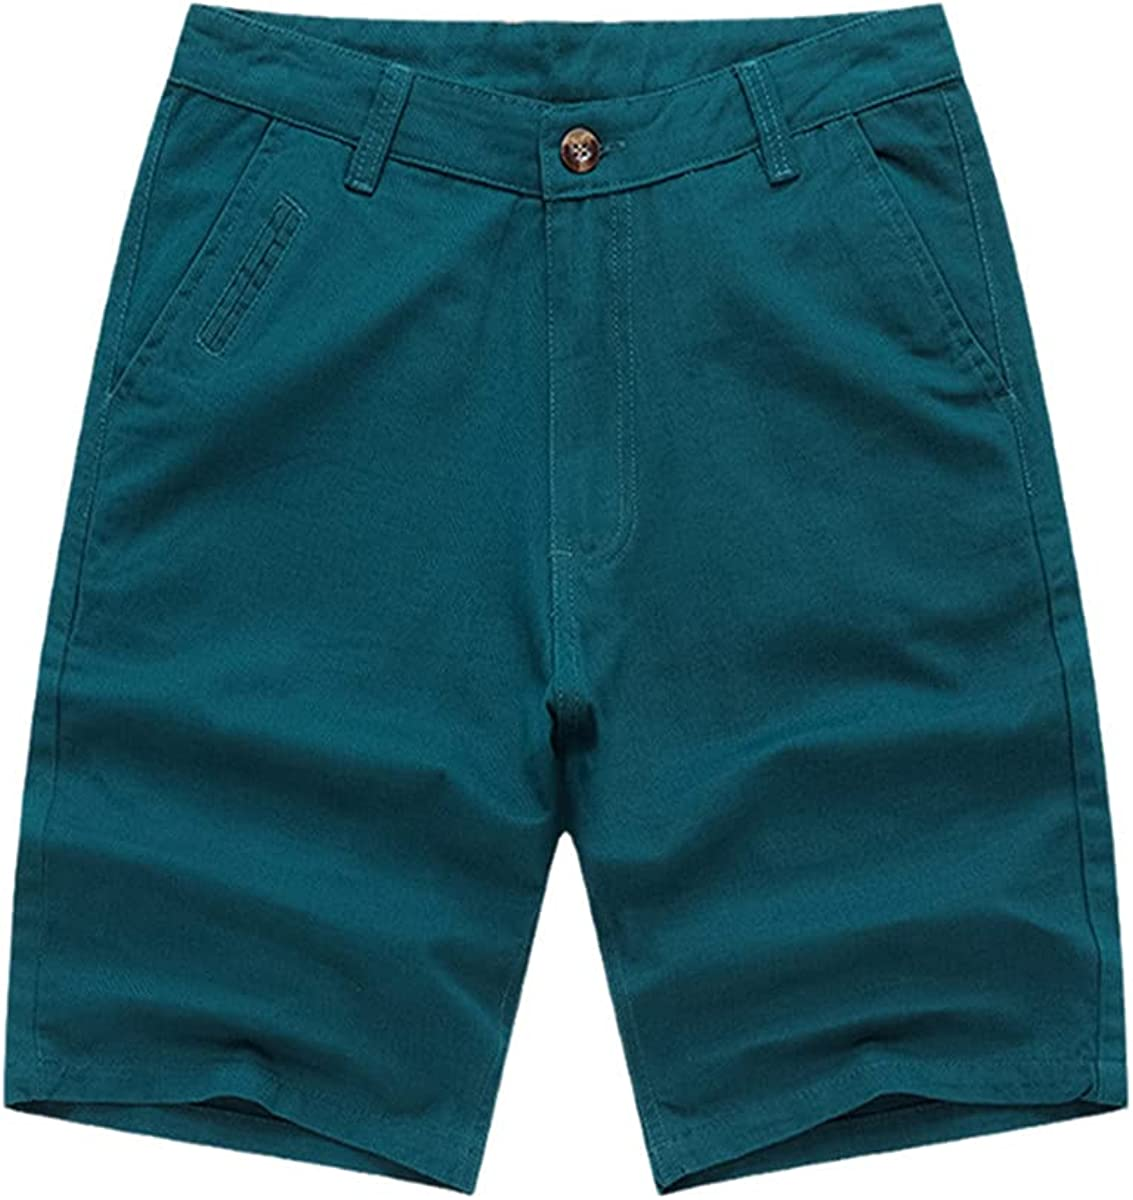 Summer Men's Casual Shorts, Pure Cotton Fashion Style Men's Shorts, Beach Pants